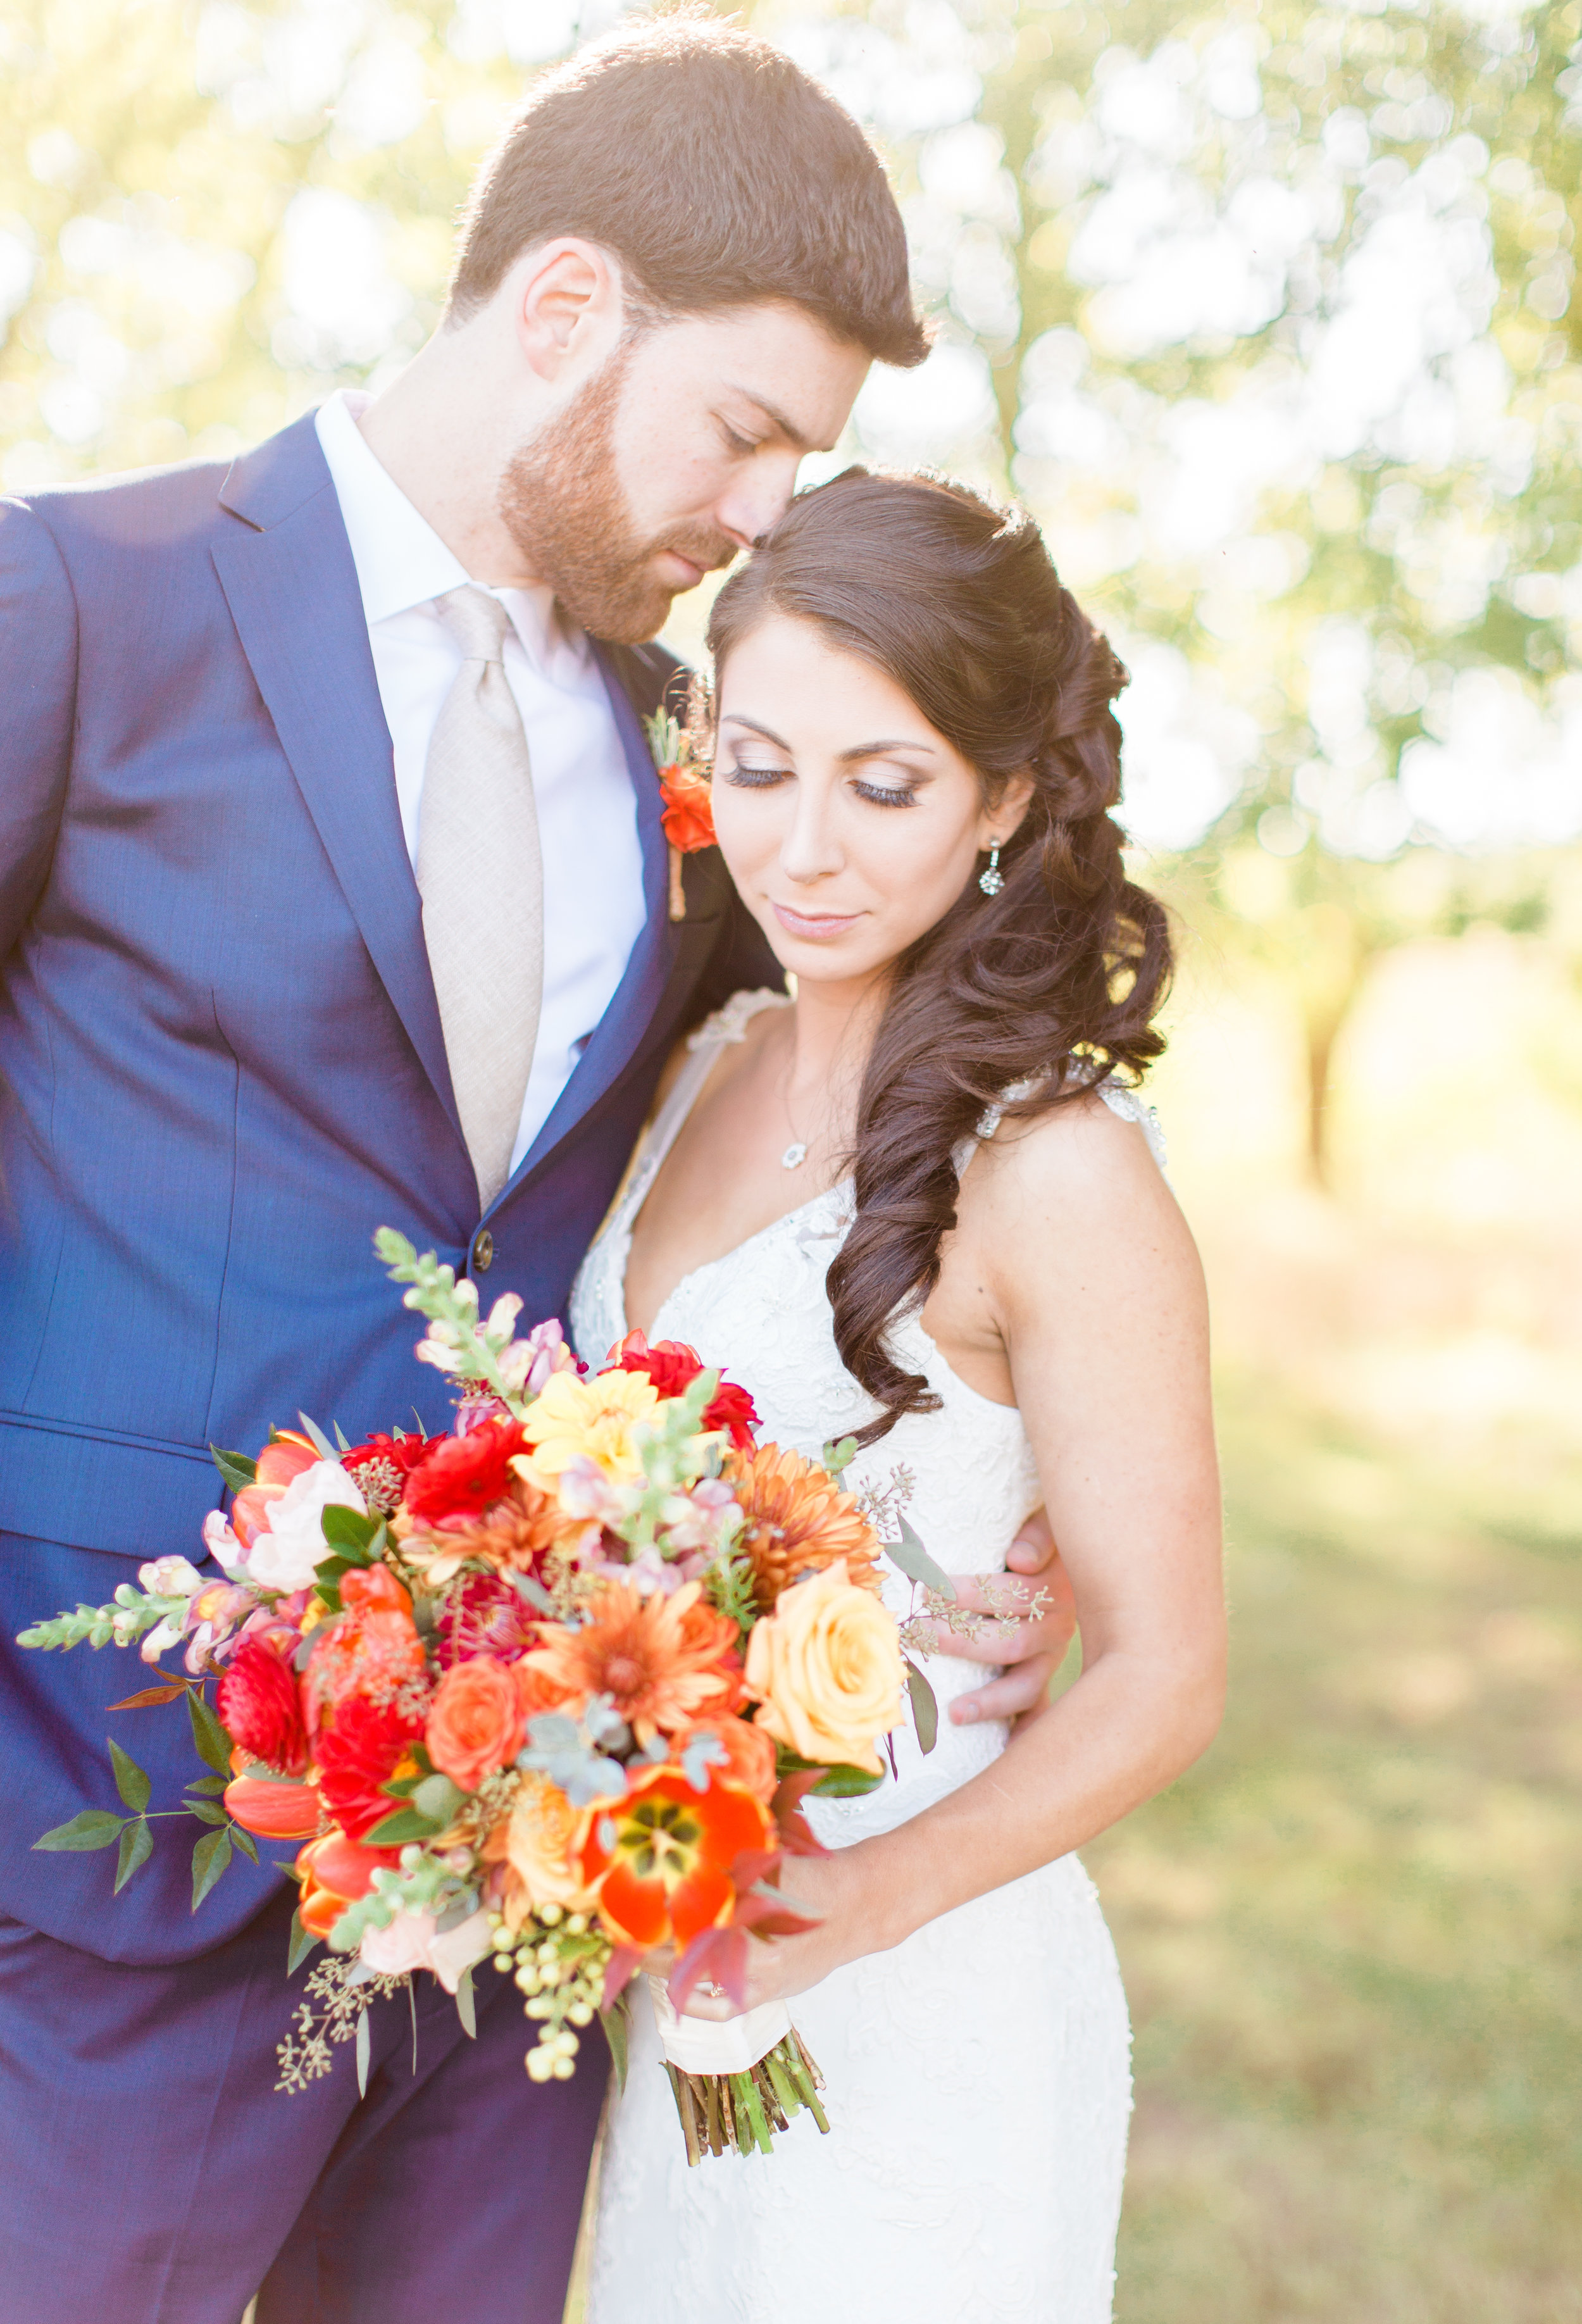 Fall Wedding at Riverside on the Potomac   Photos by Sarah Beth